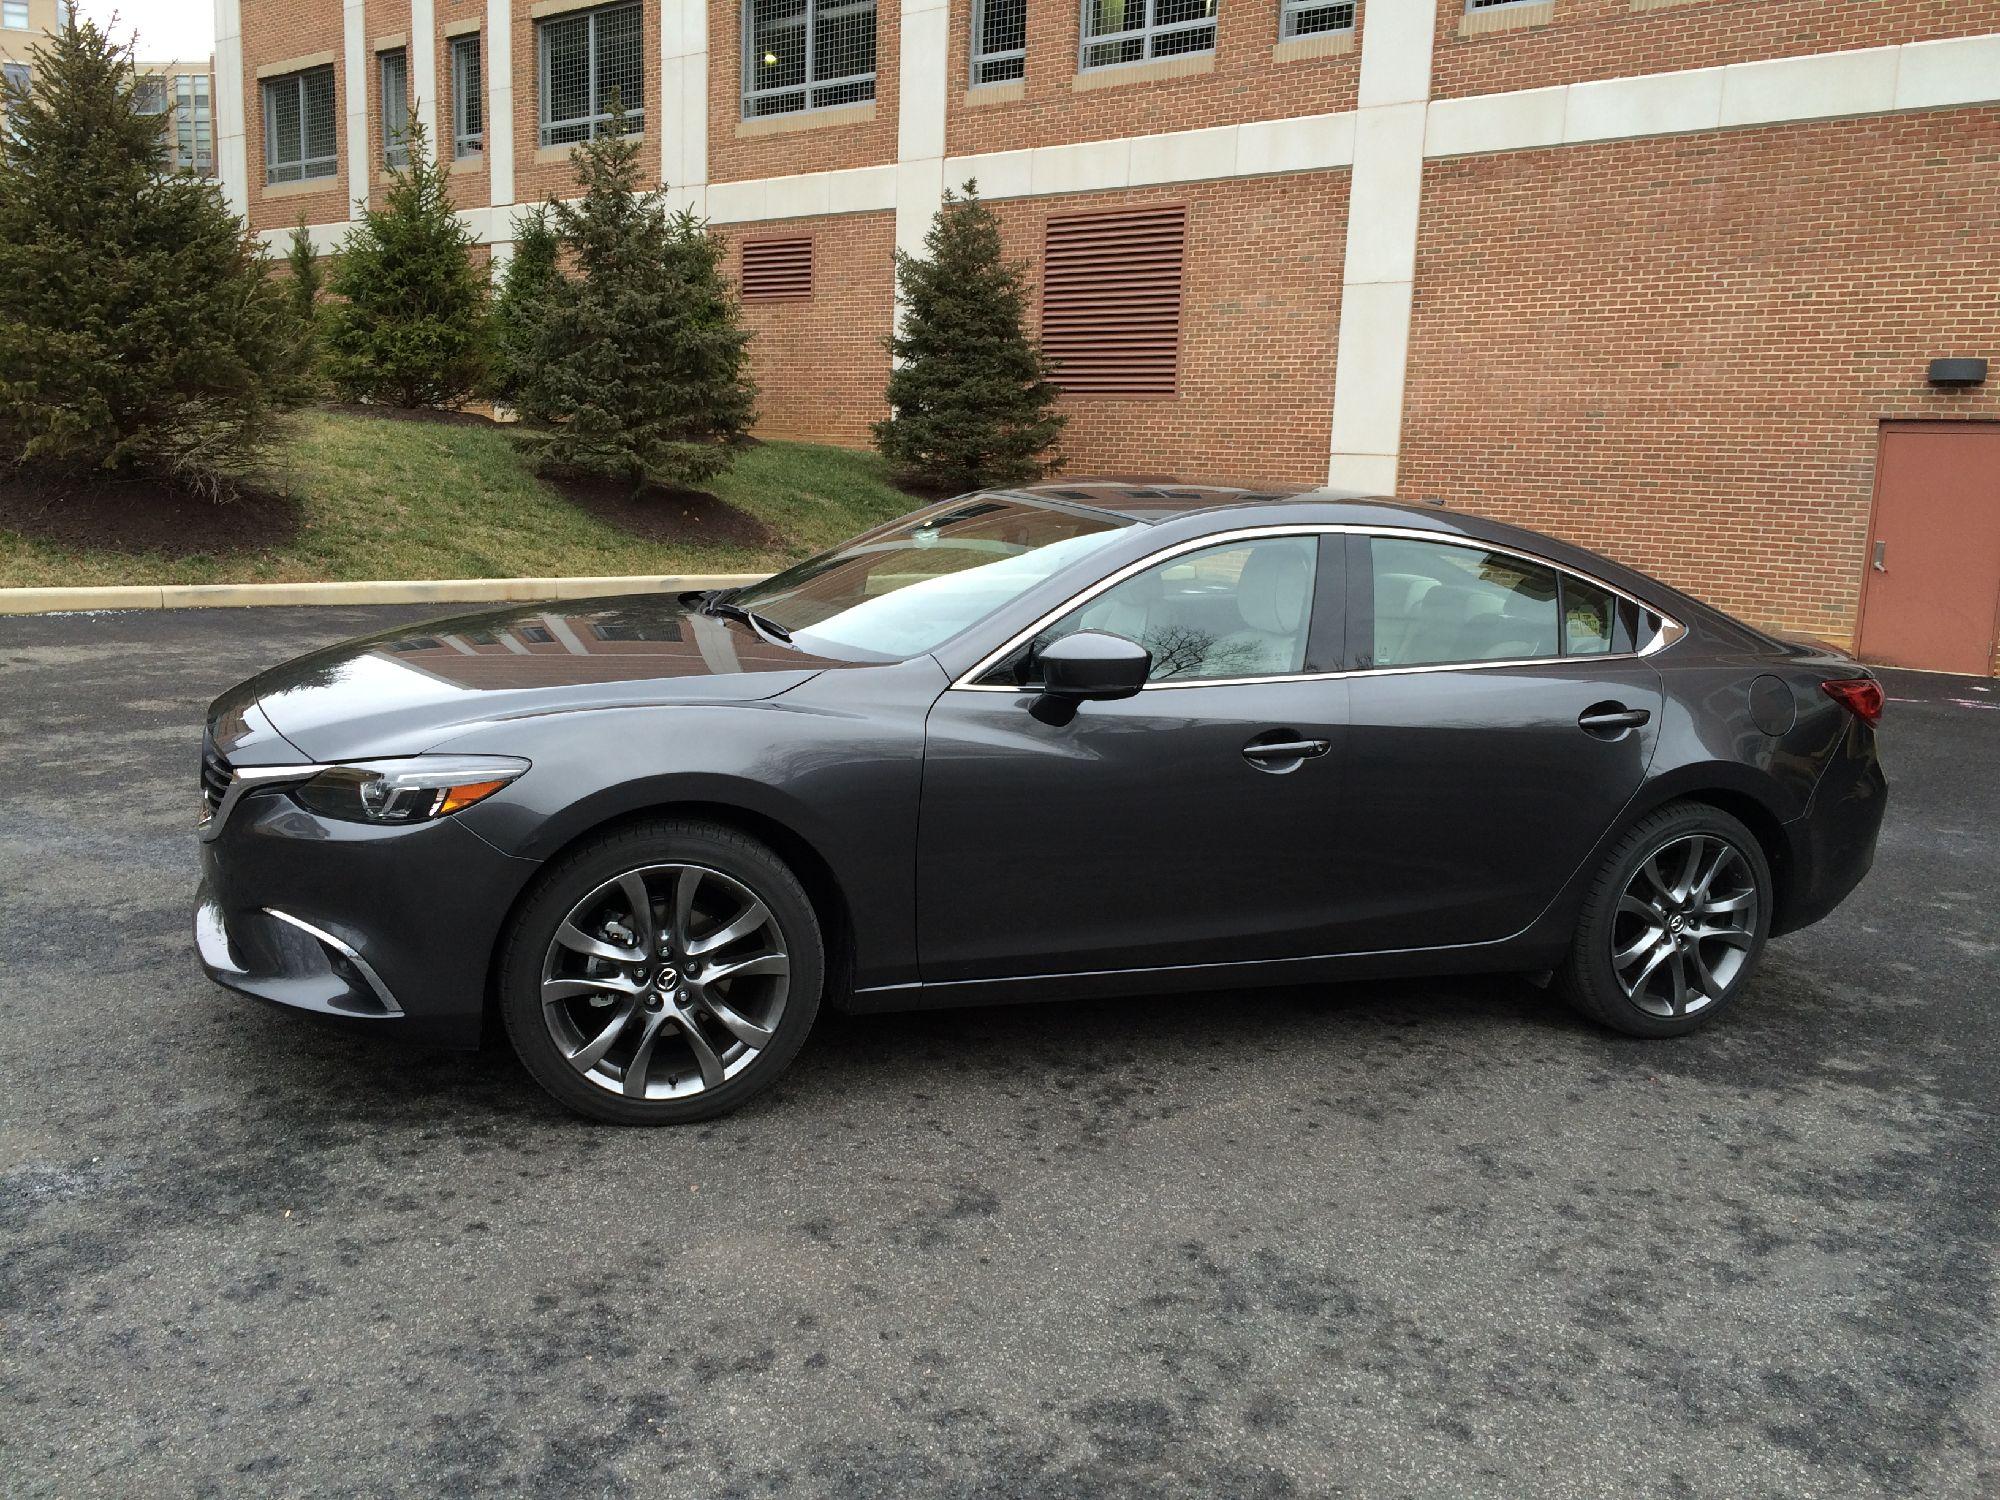 Mazda adds fresh style, elegant design to 2017 Mazda 6 Touring | WTOP